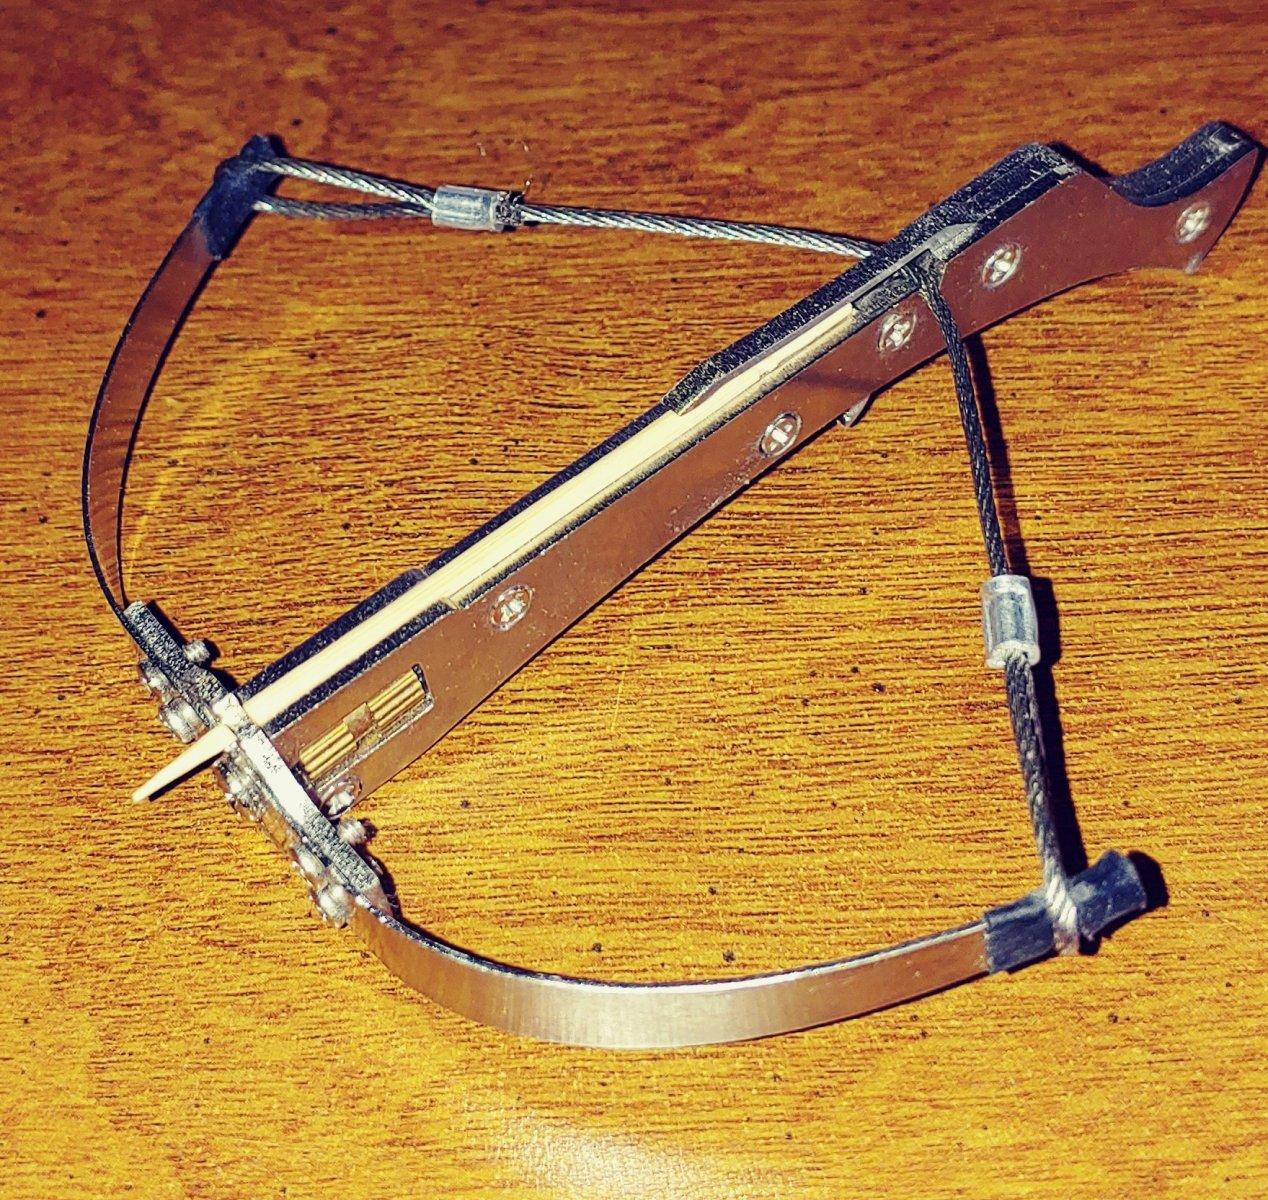 minicrossbow.jpg